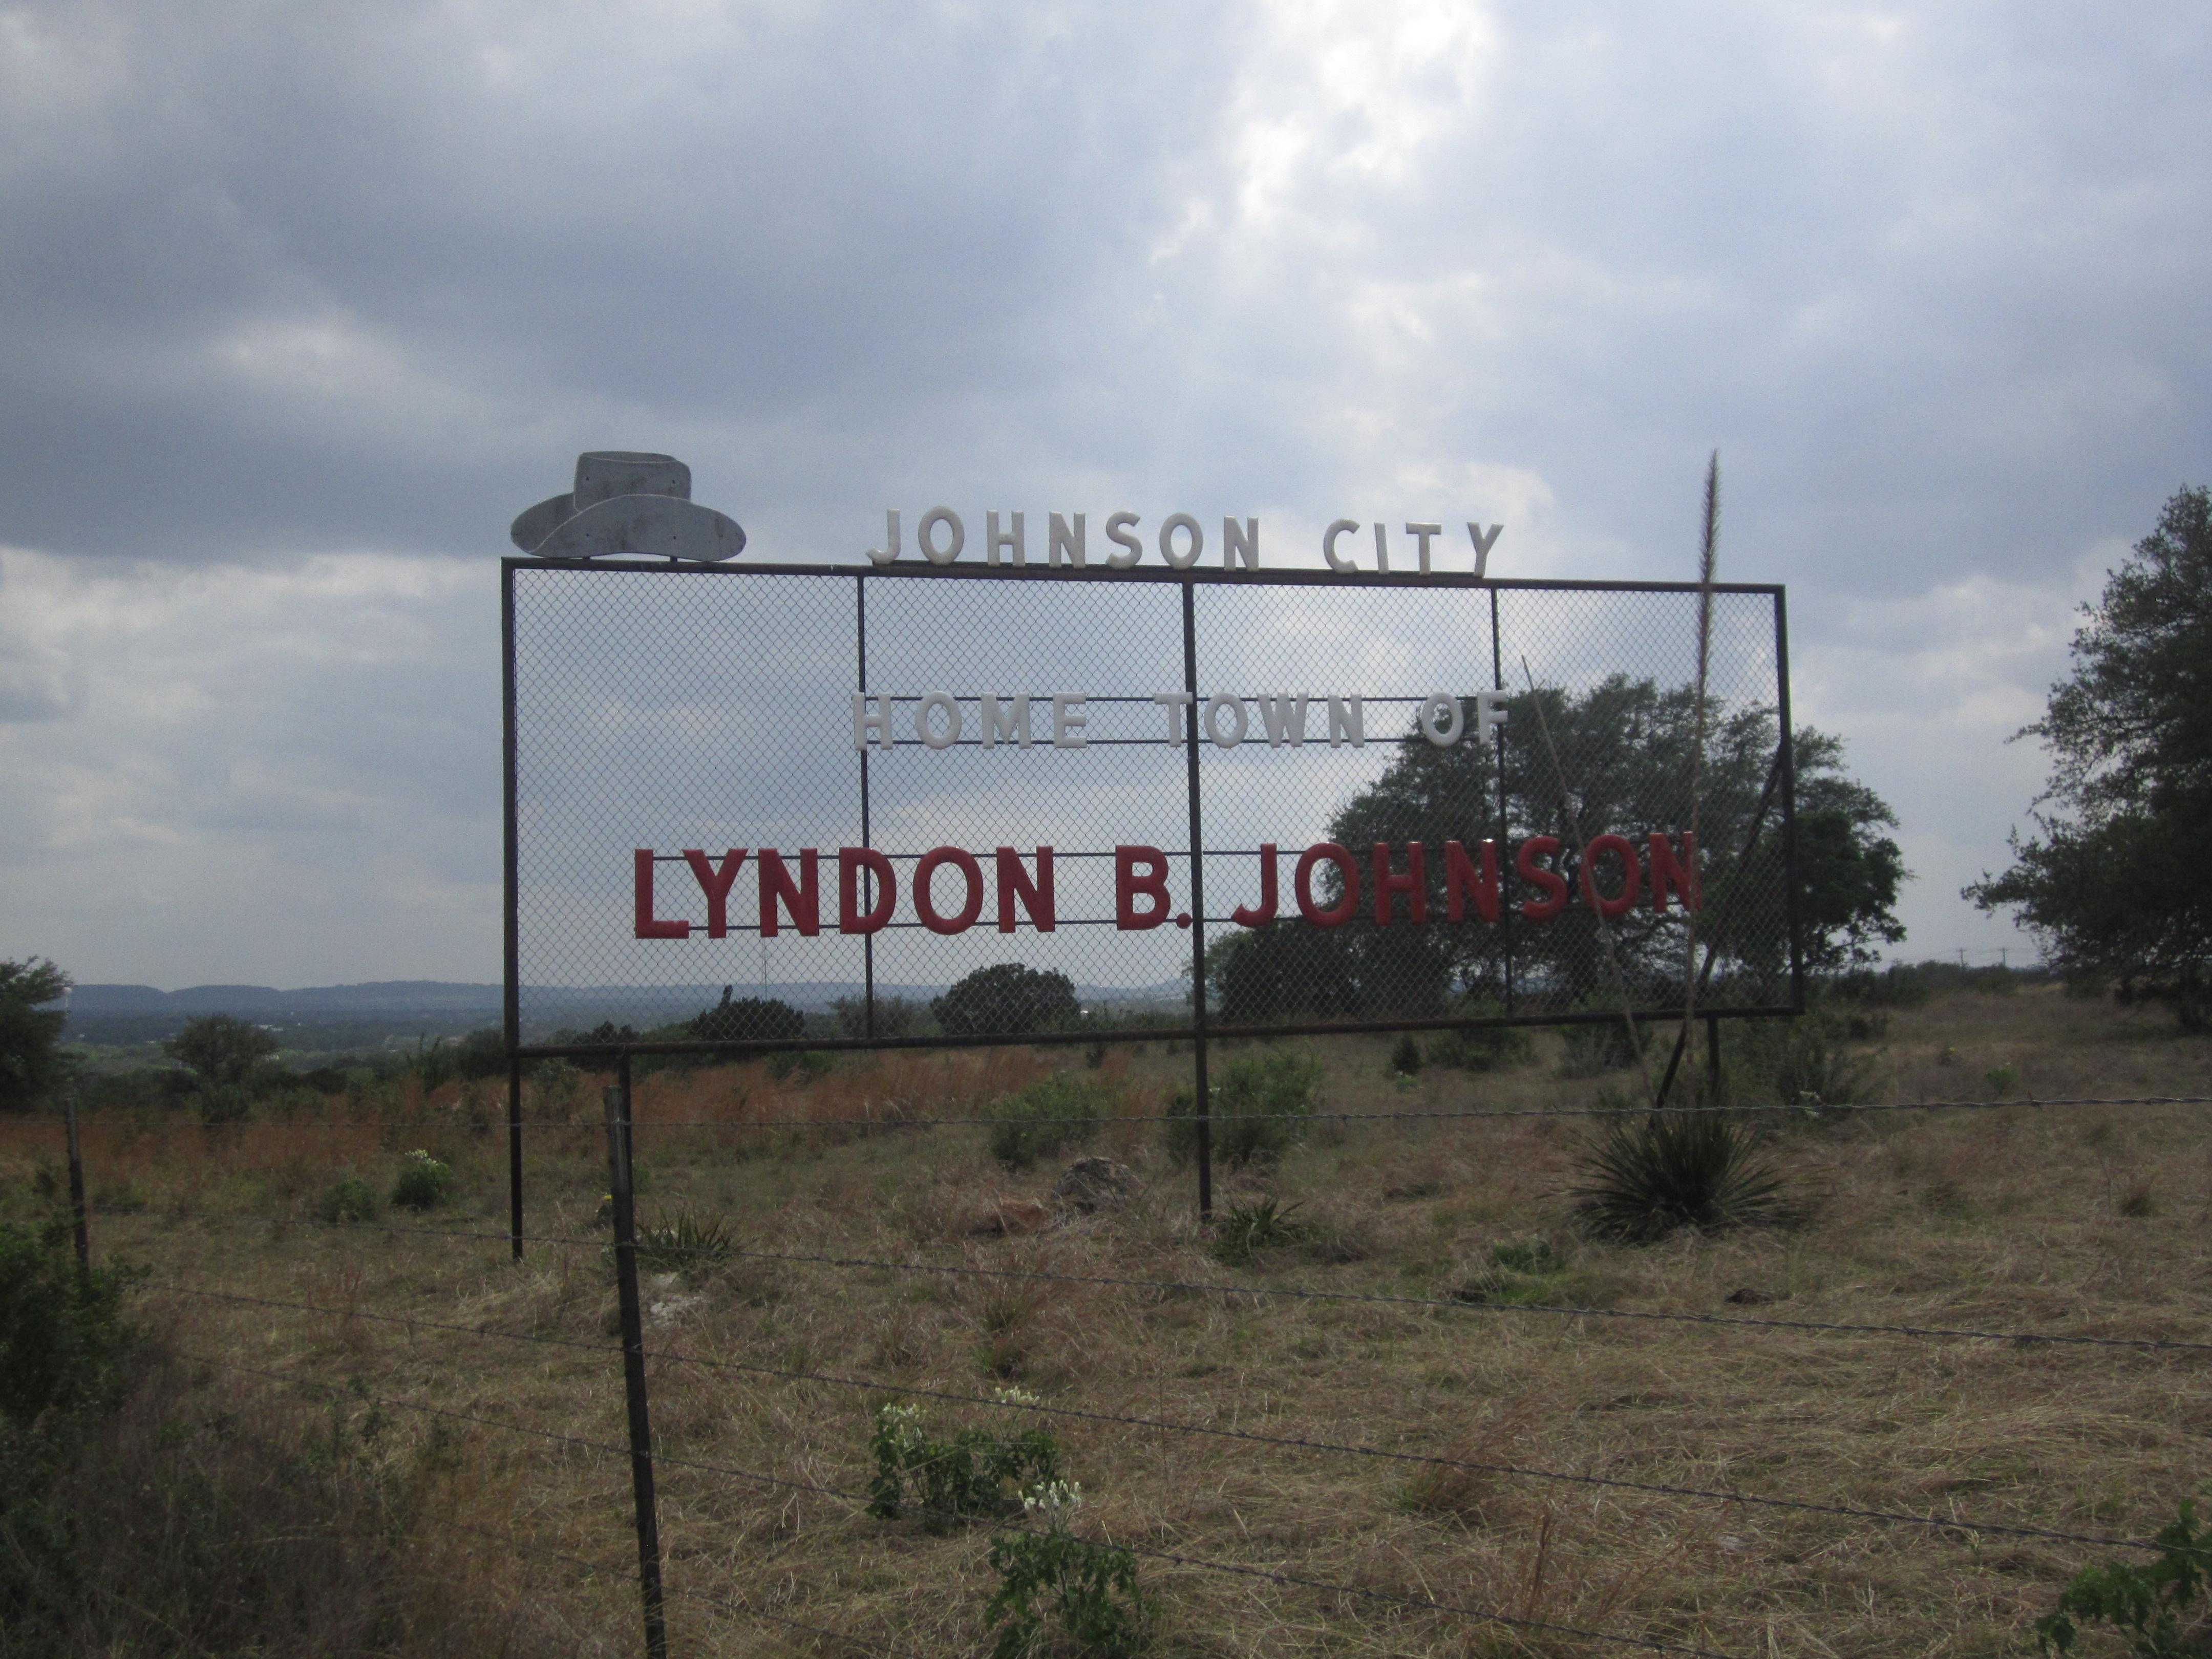 Johnson_City,_TX,_sign_IMG_ ...johnson city city